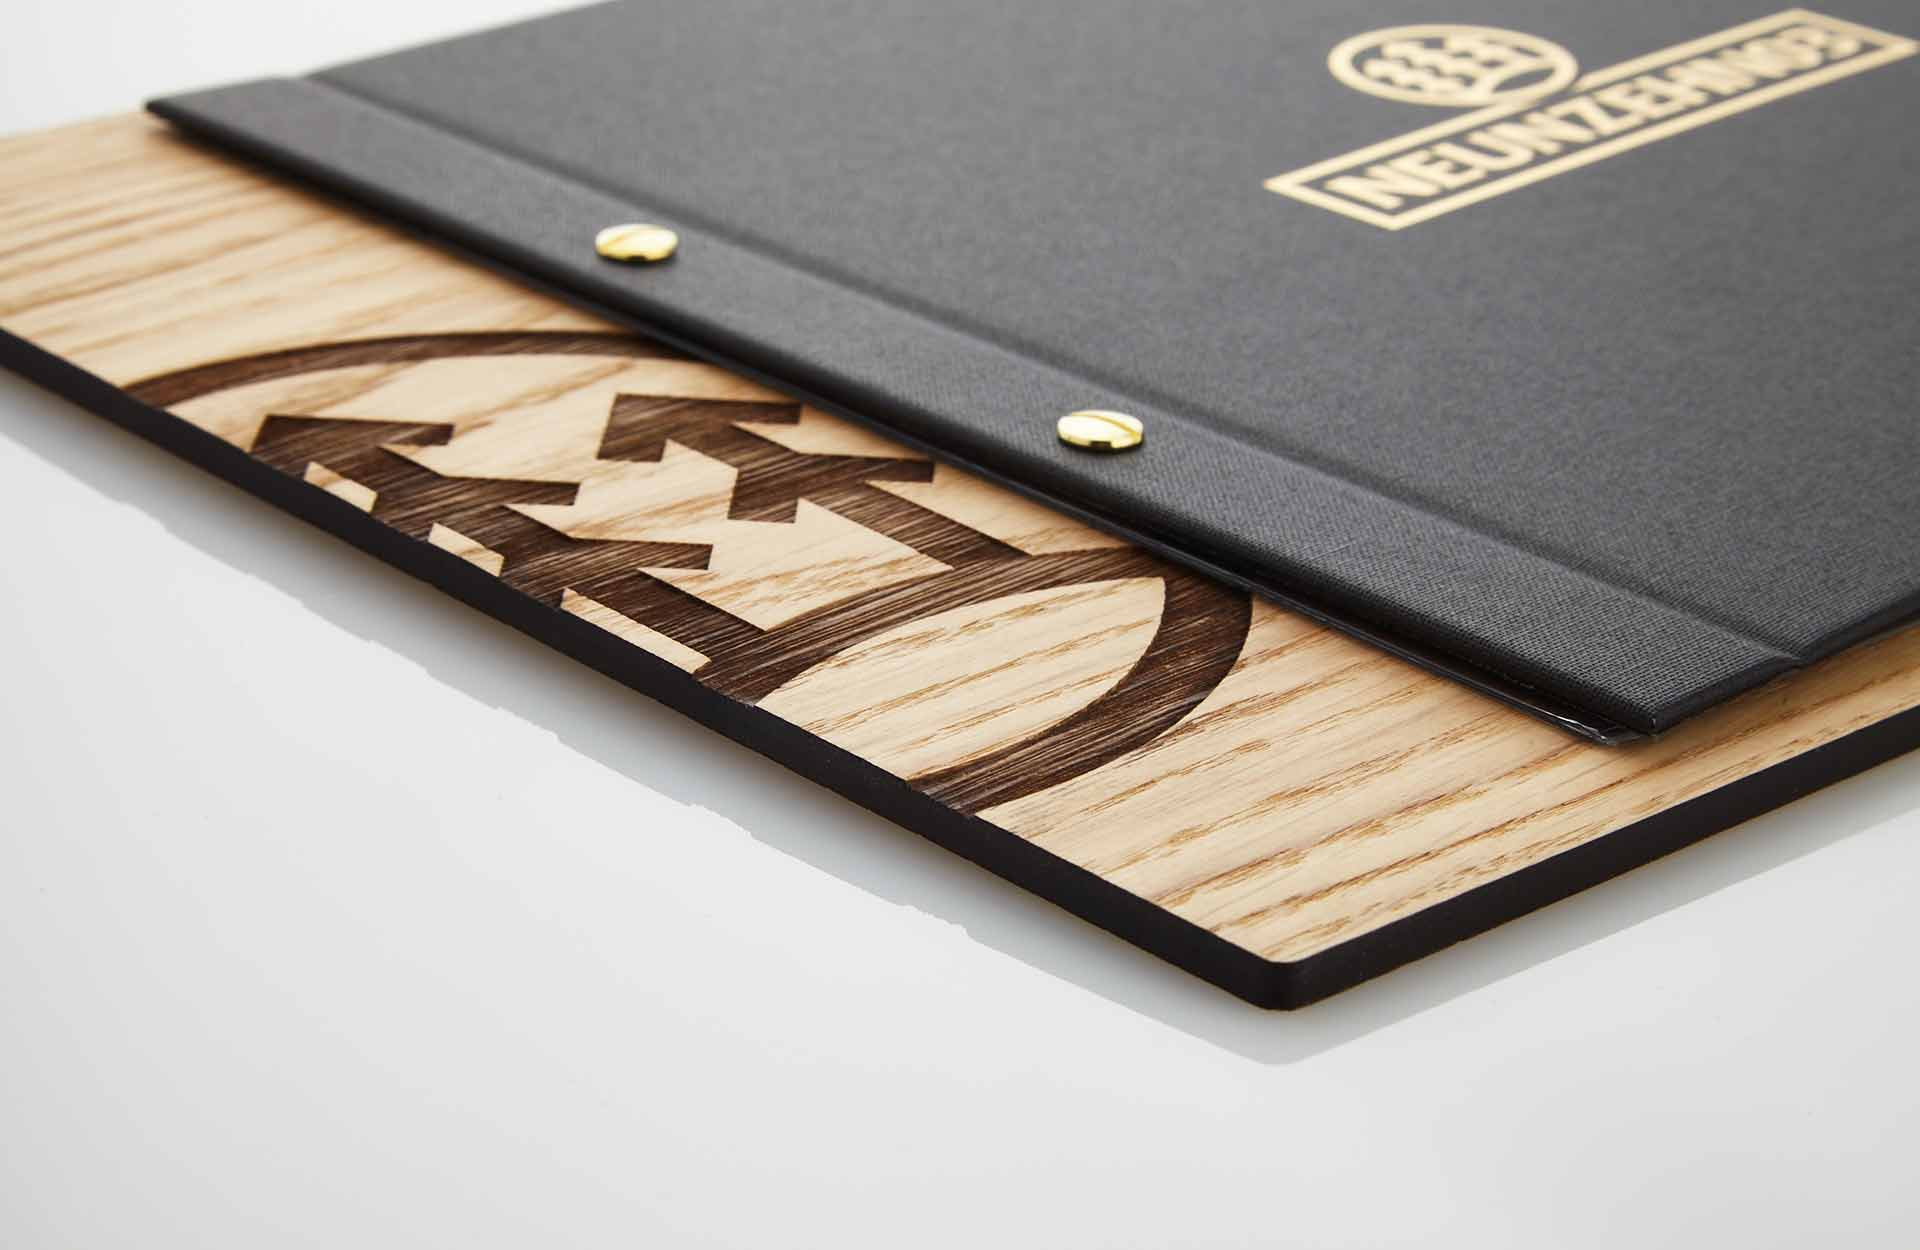 Gastrotopcard Speisekarte Selectboard Eiche mit Medicicover